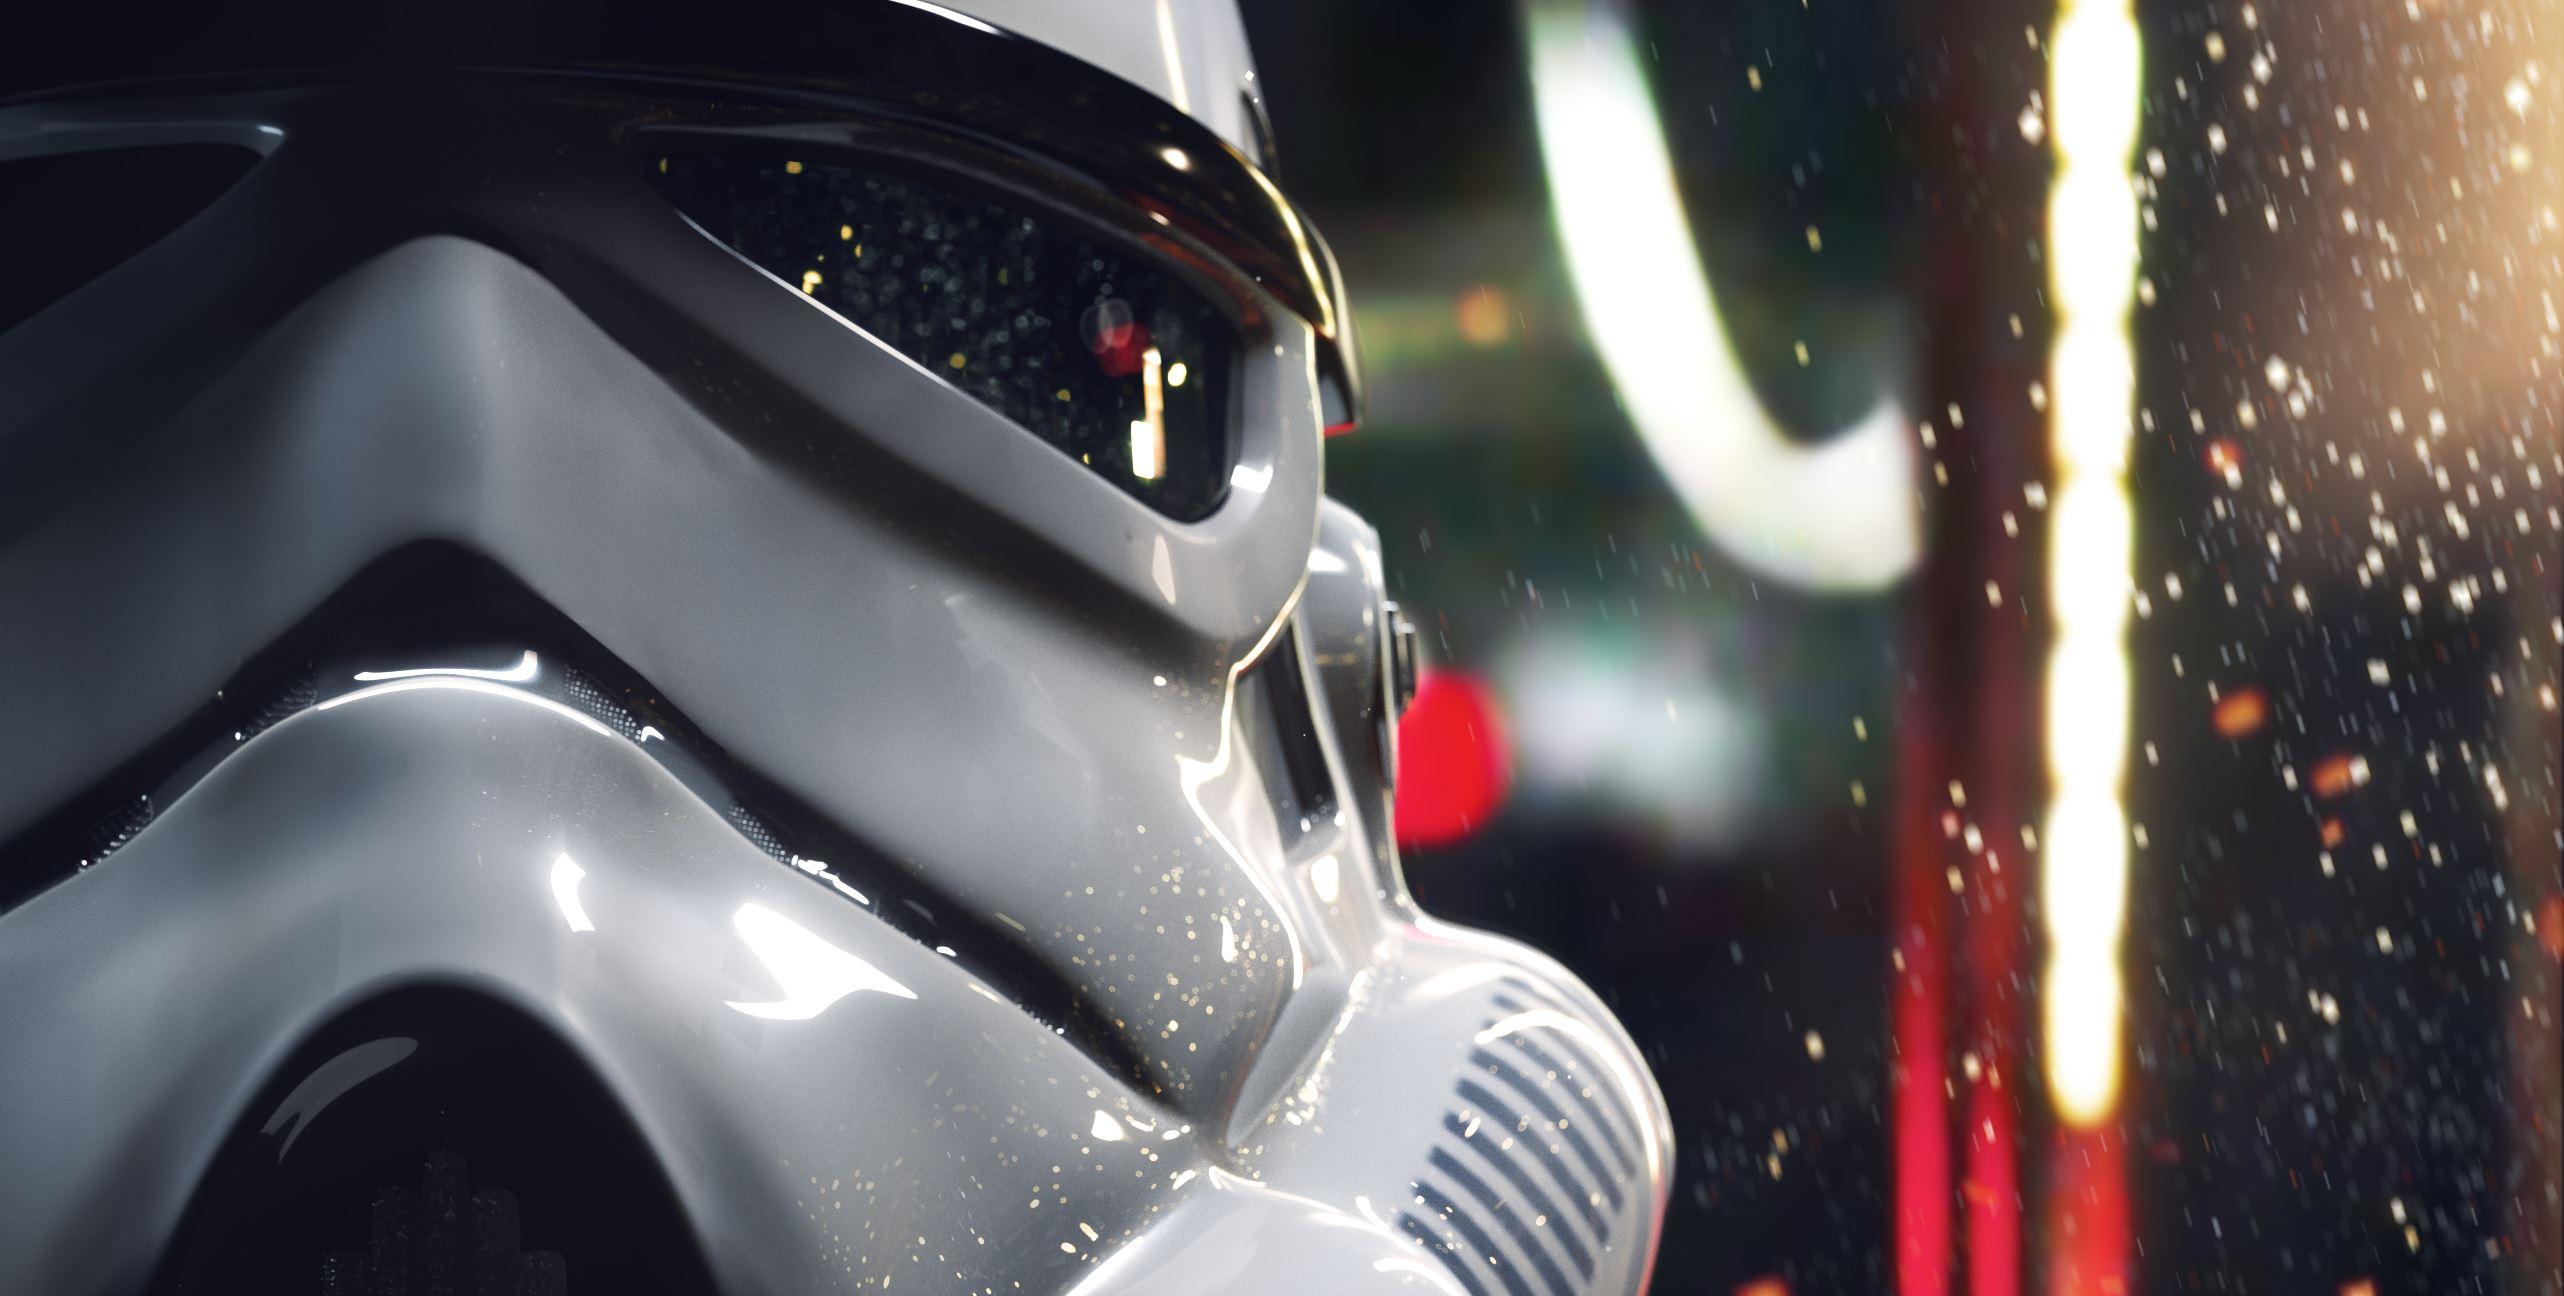 StormtrooperStyleframe2